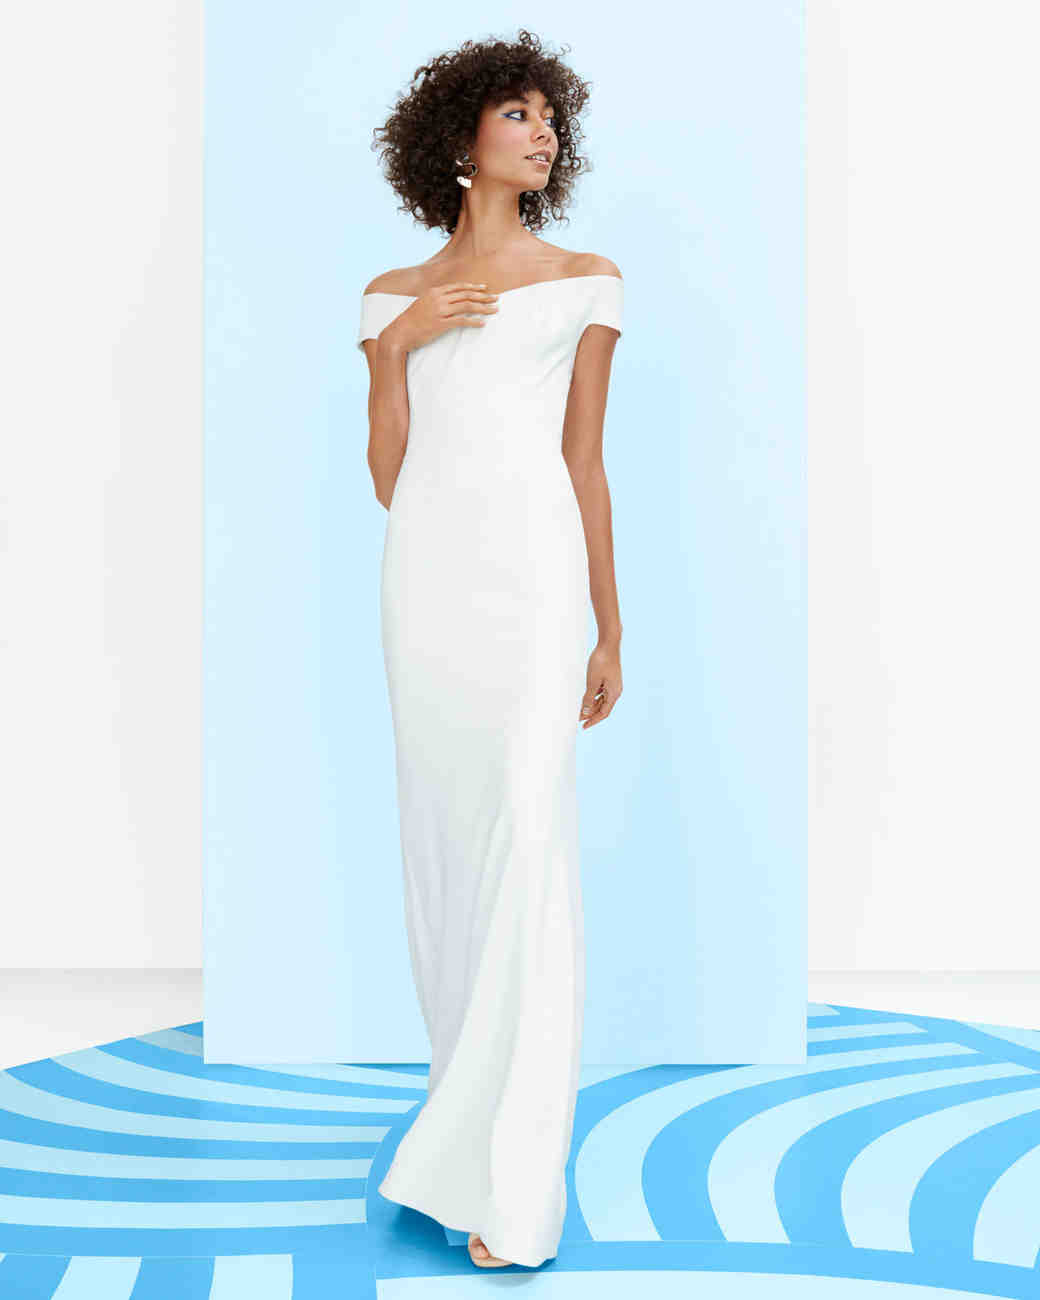 3b0d802b5c27de Best Wedding Dress For Hourglass Body Type